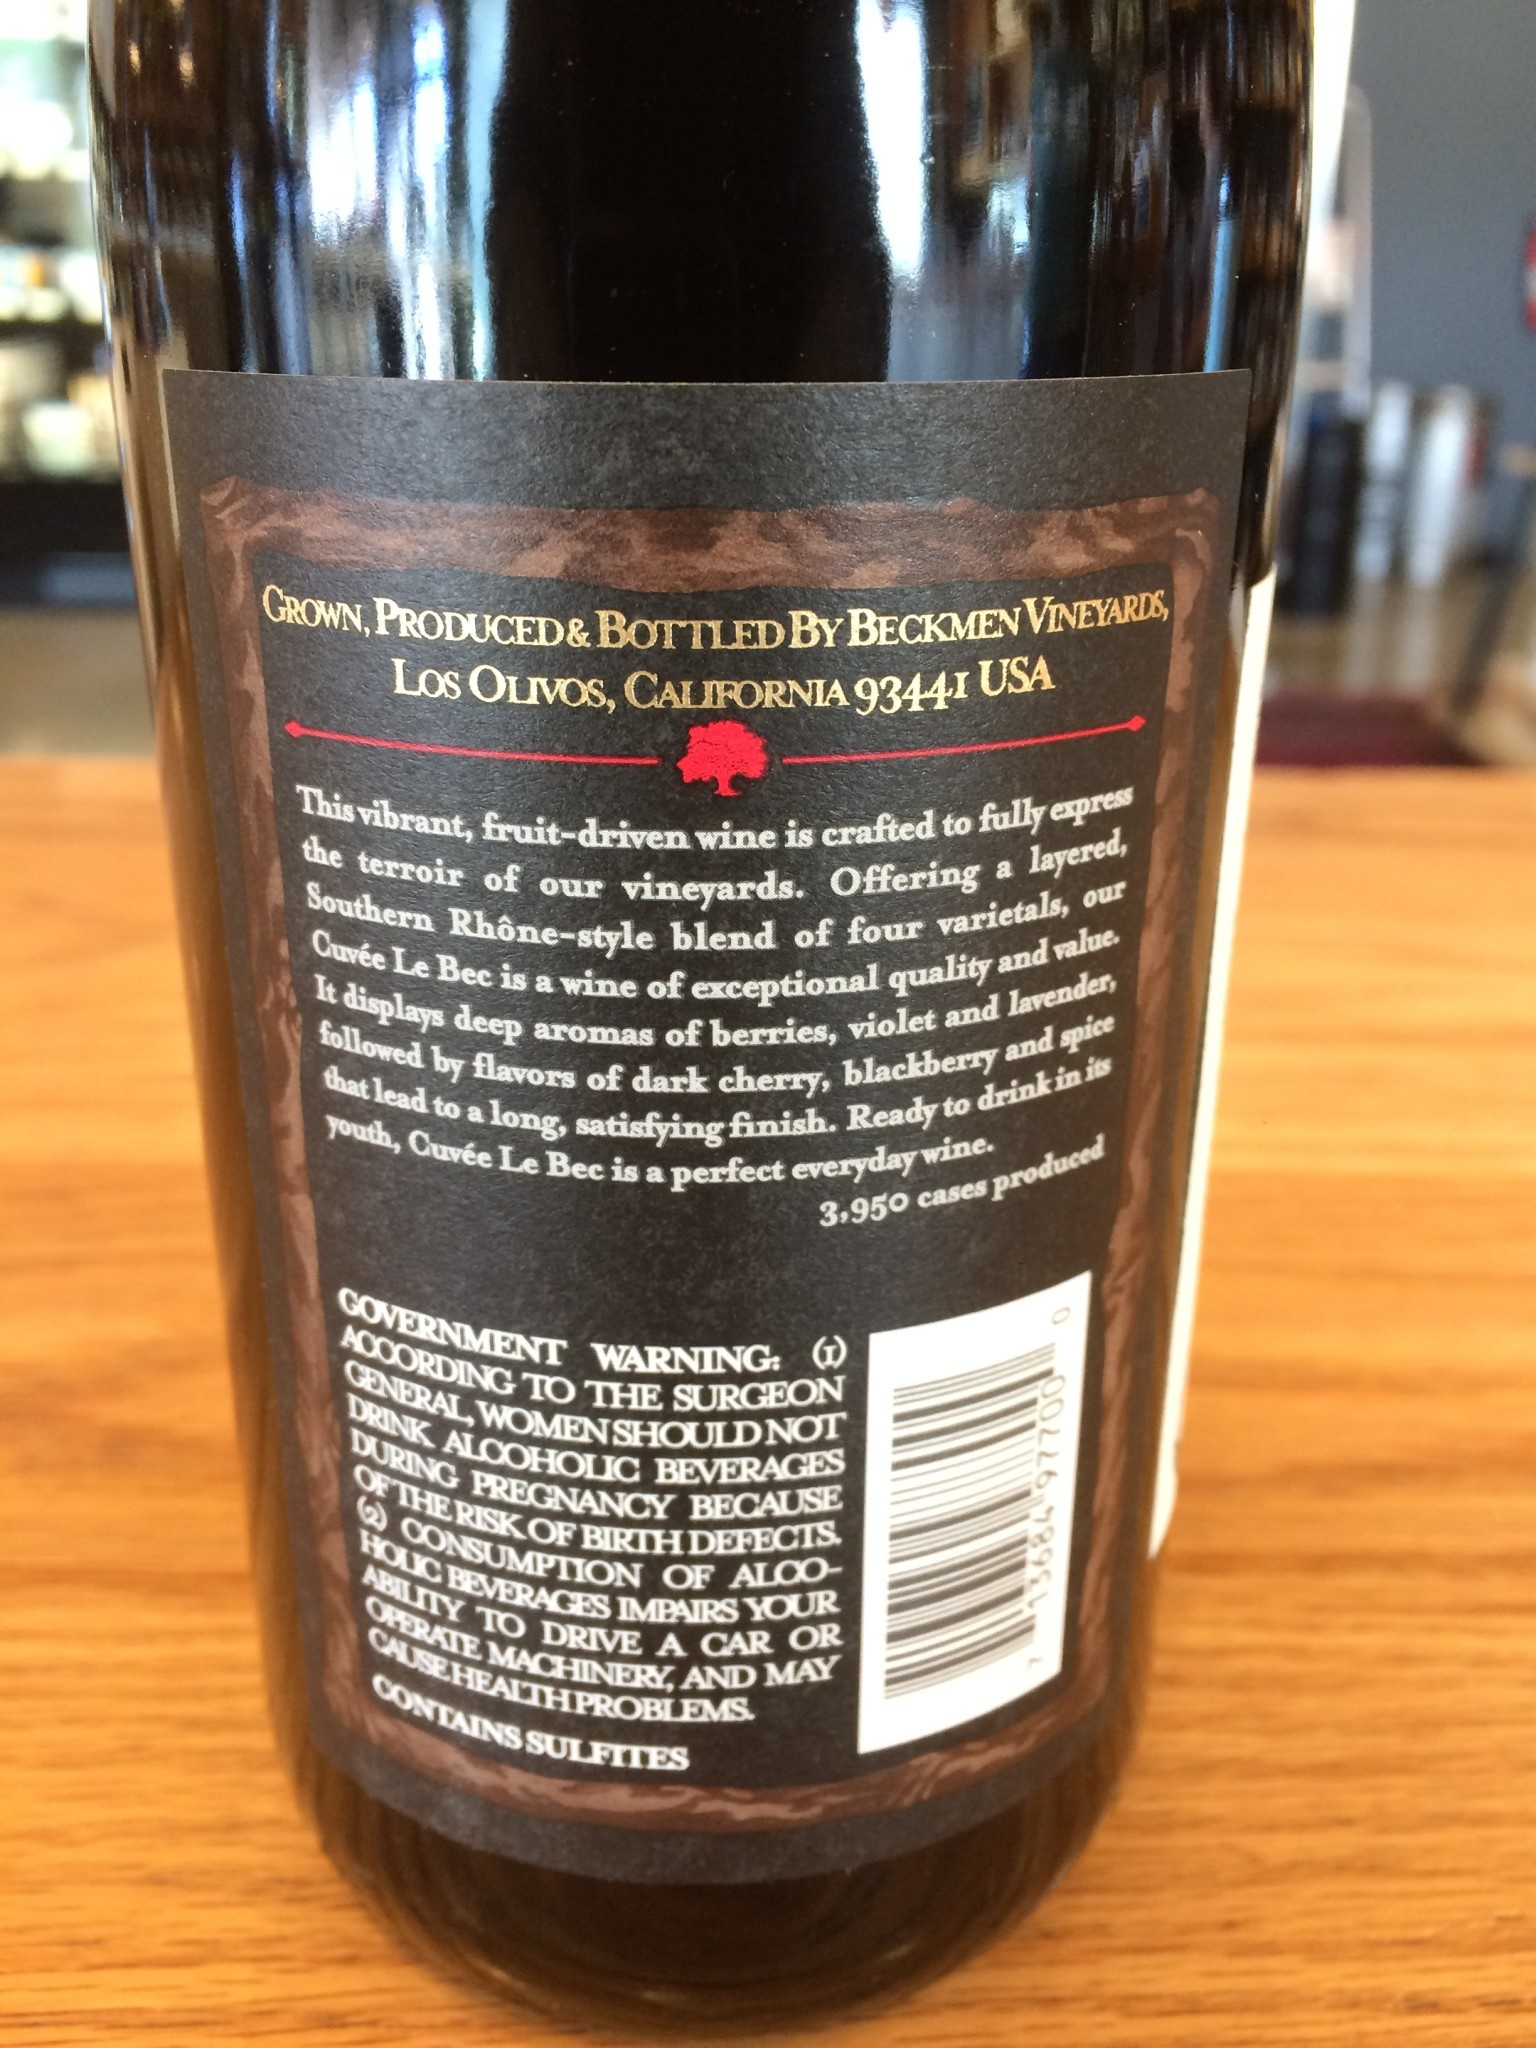 2017 Beckmen Vineyards Cuvee Le Bec Santa Ynez Estate 750ml